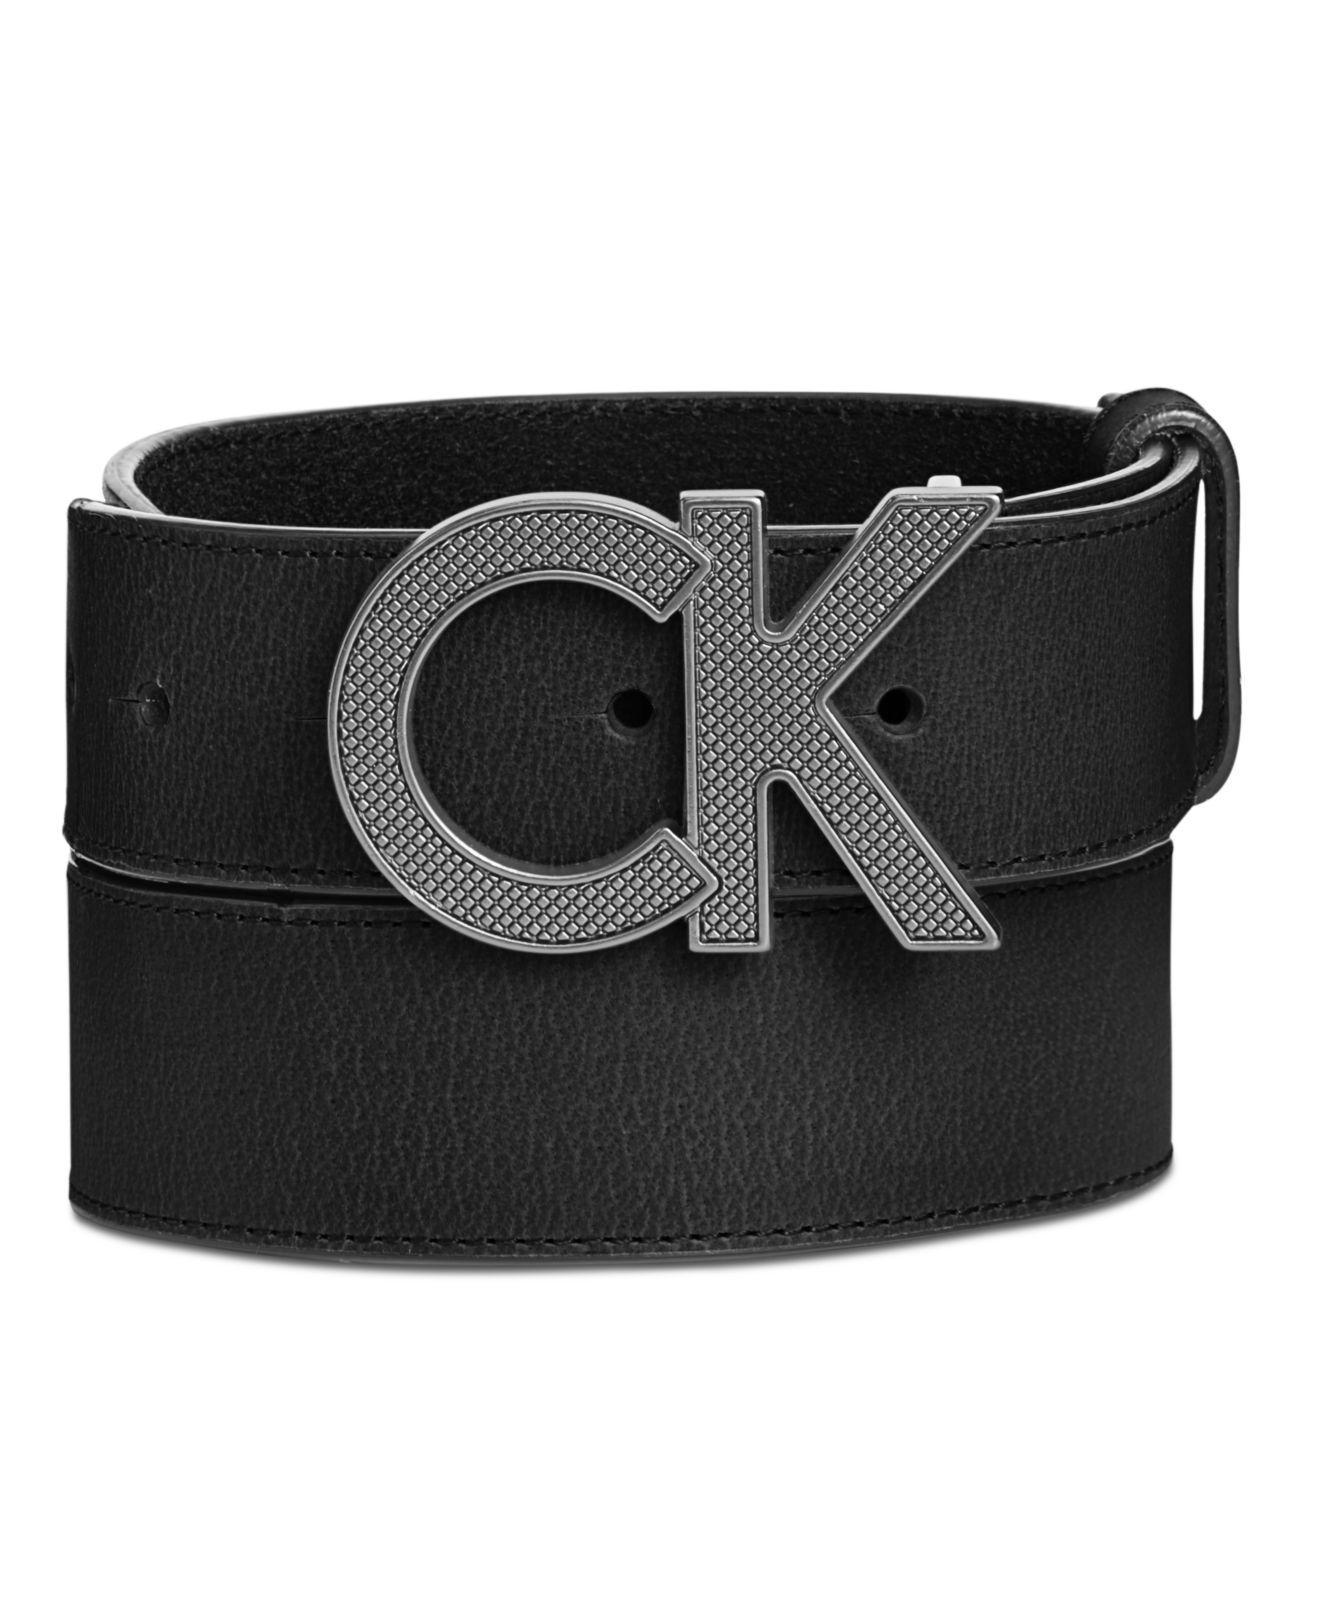 Lyst - Calvin Klein Men s Matte Leather Casual Logo Belt in Black ... 03fe9501d19